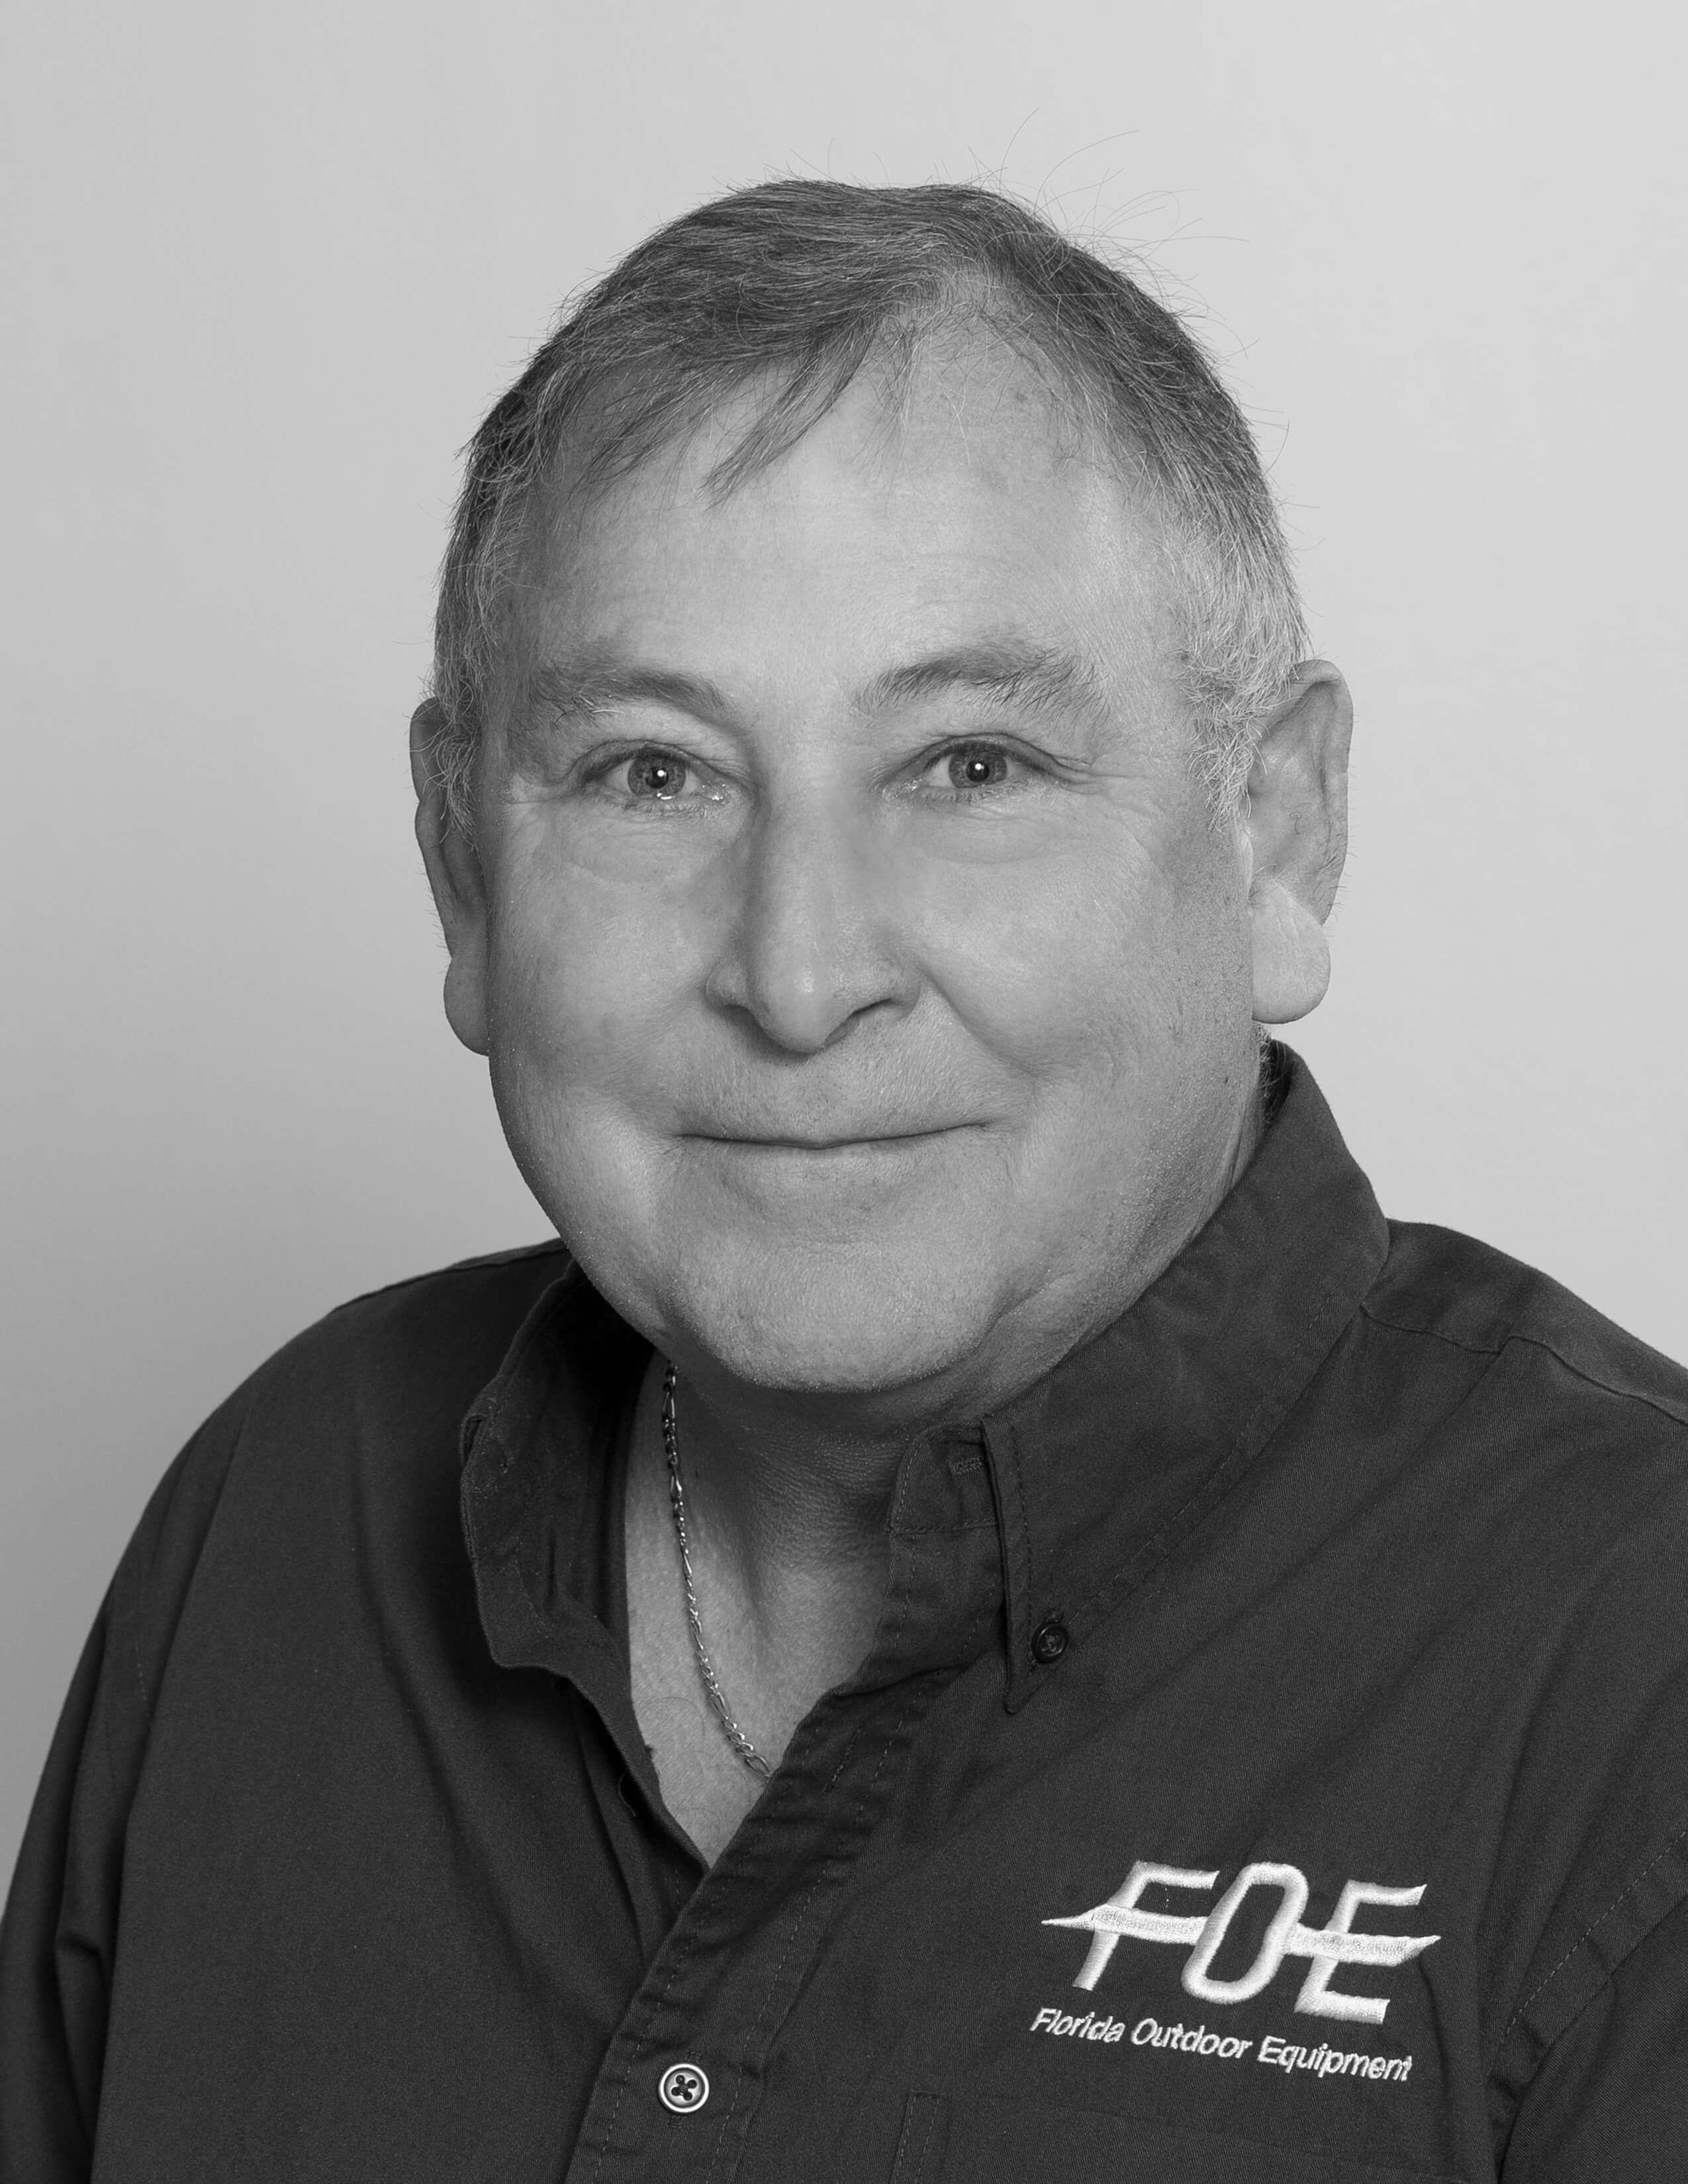 Tony Delogos profile image